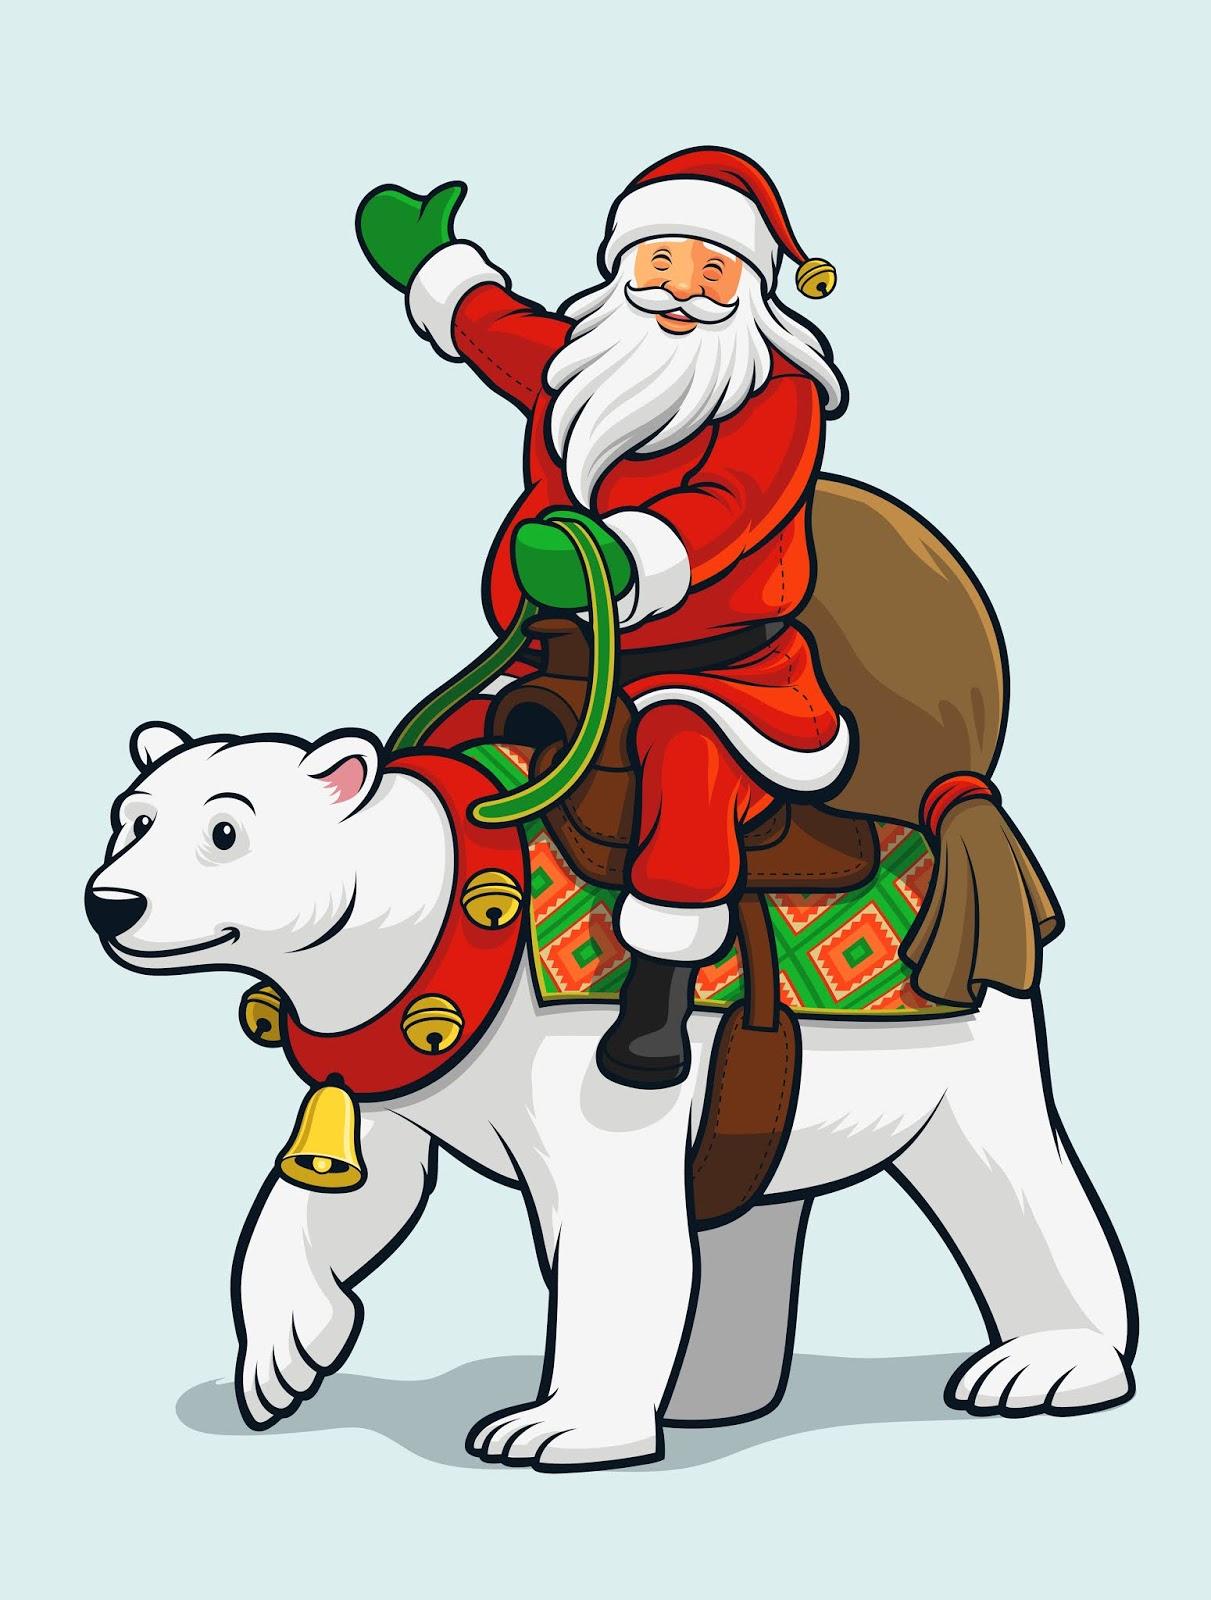 Santa Claus Riding Polar Bear Free Download Vector CDR, AI, EPS and PNG Formats